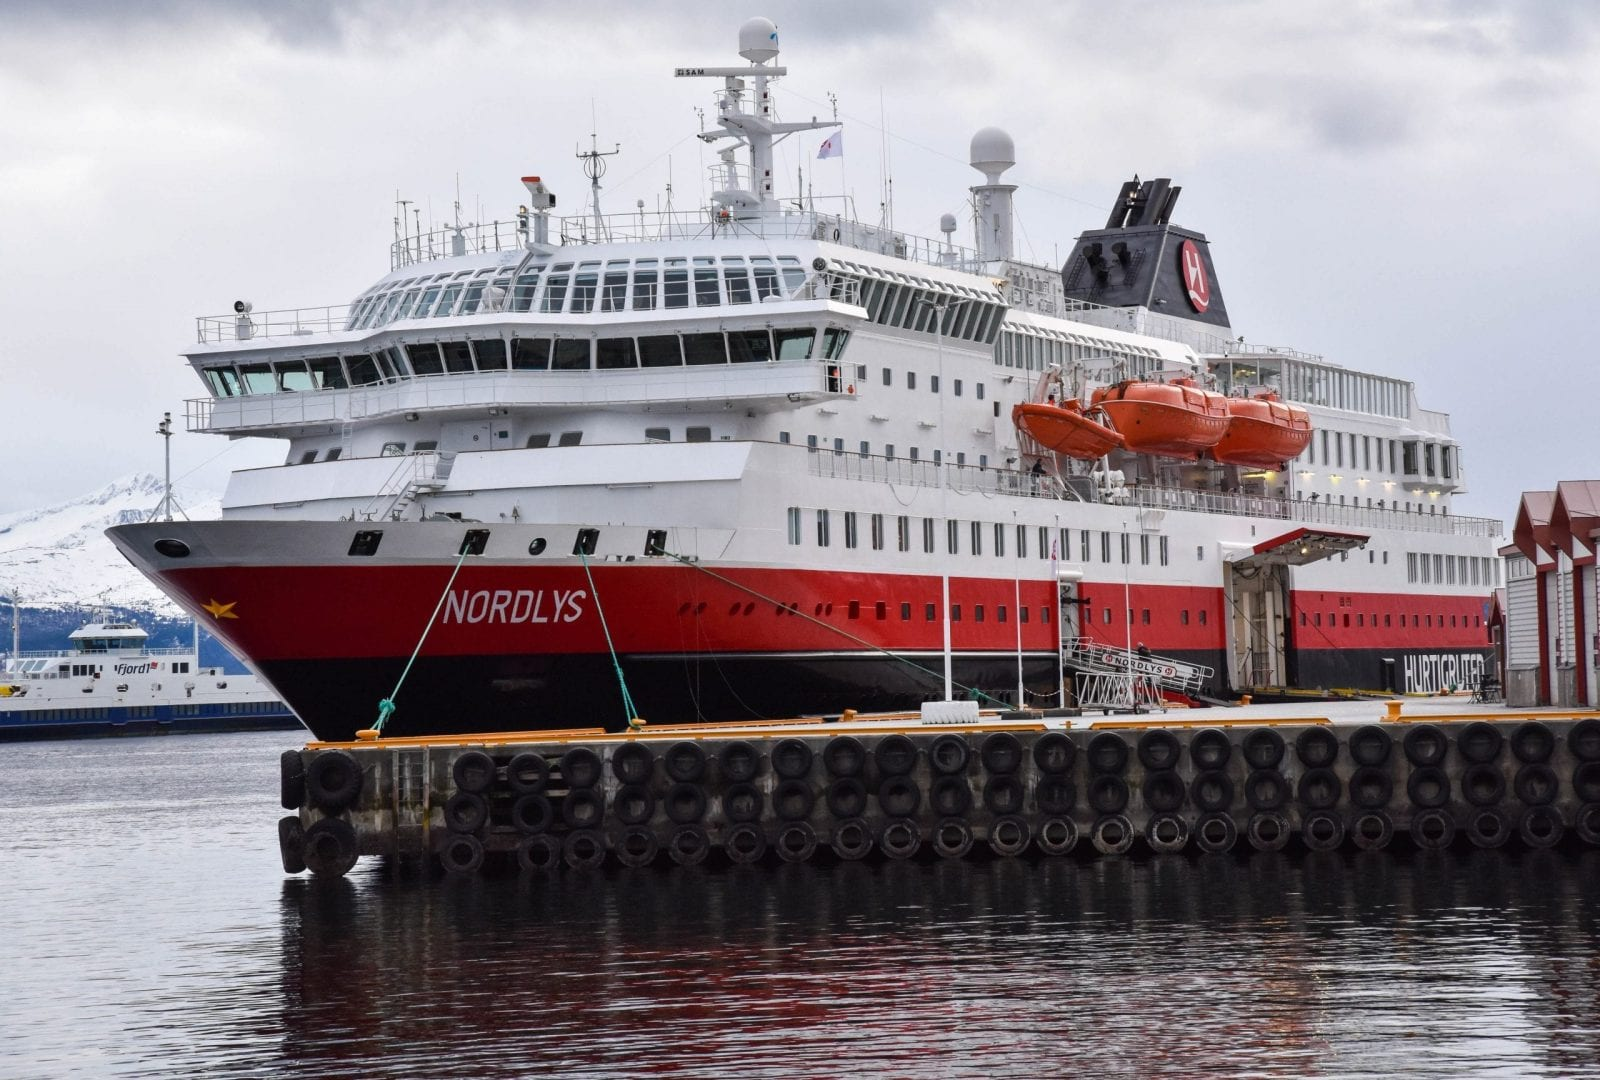 Nordlys, Hurtigruten Ship, Norway